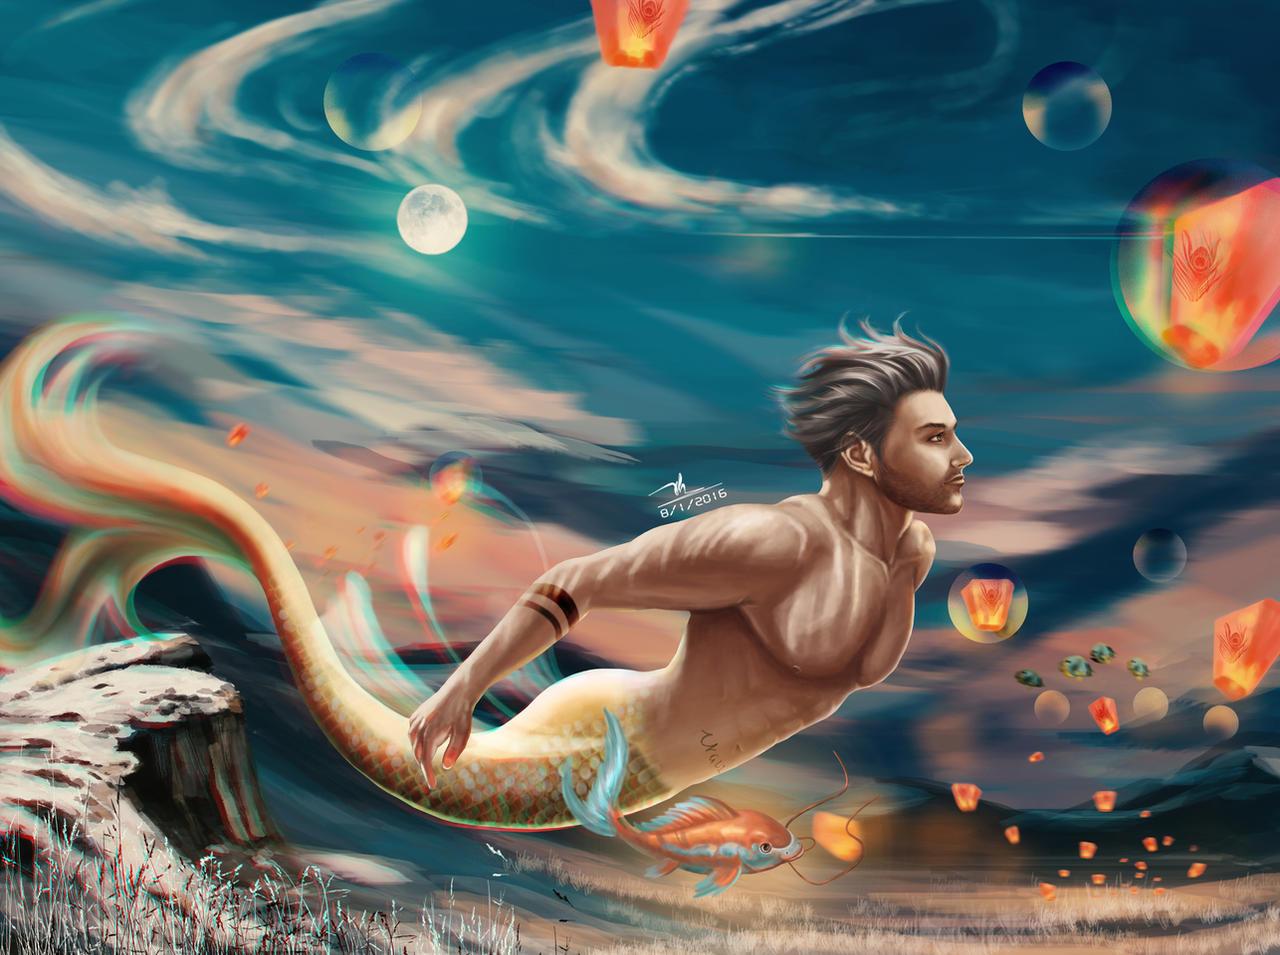 Merman Jack (Turrow) Art - Turrow Fanfiction/Fanart